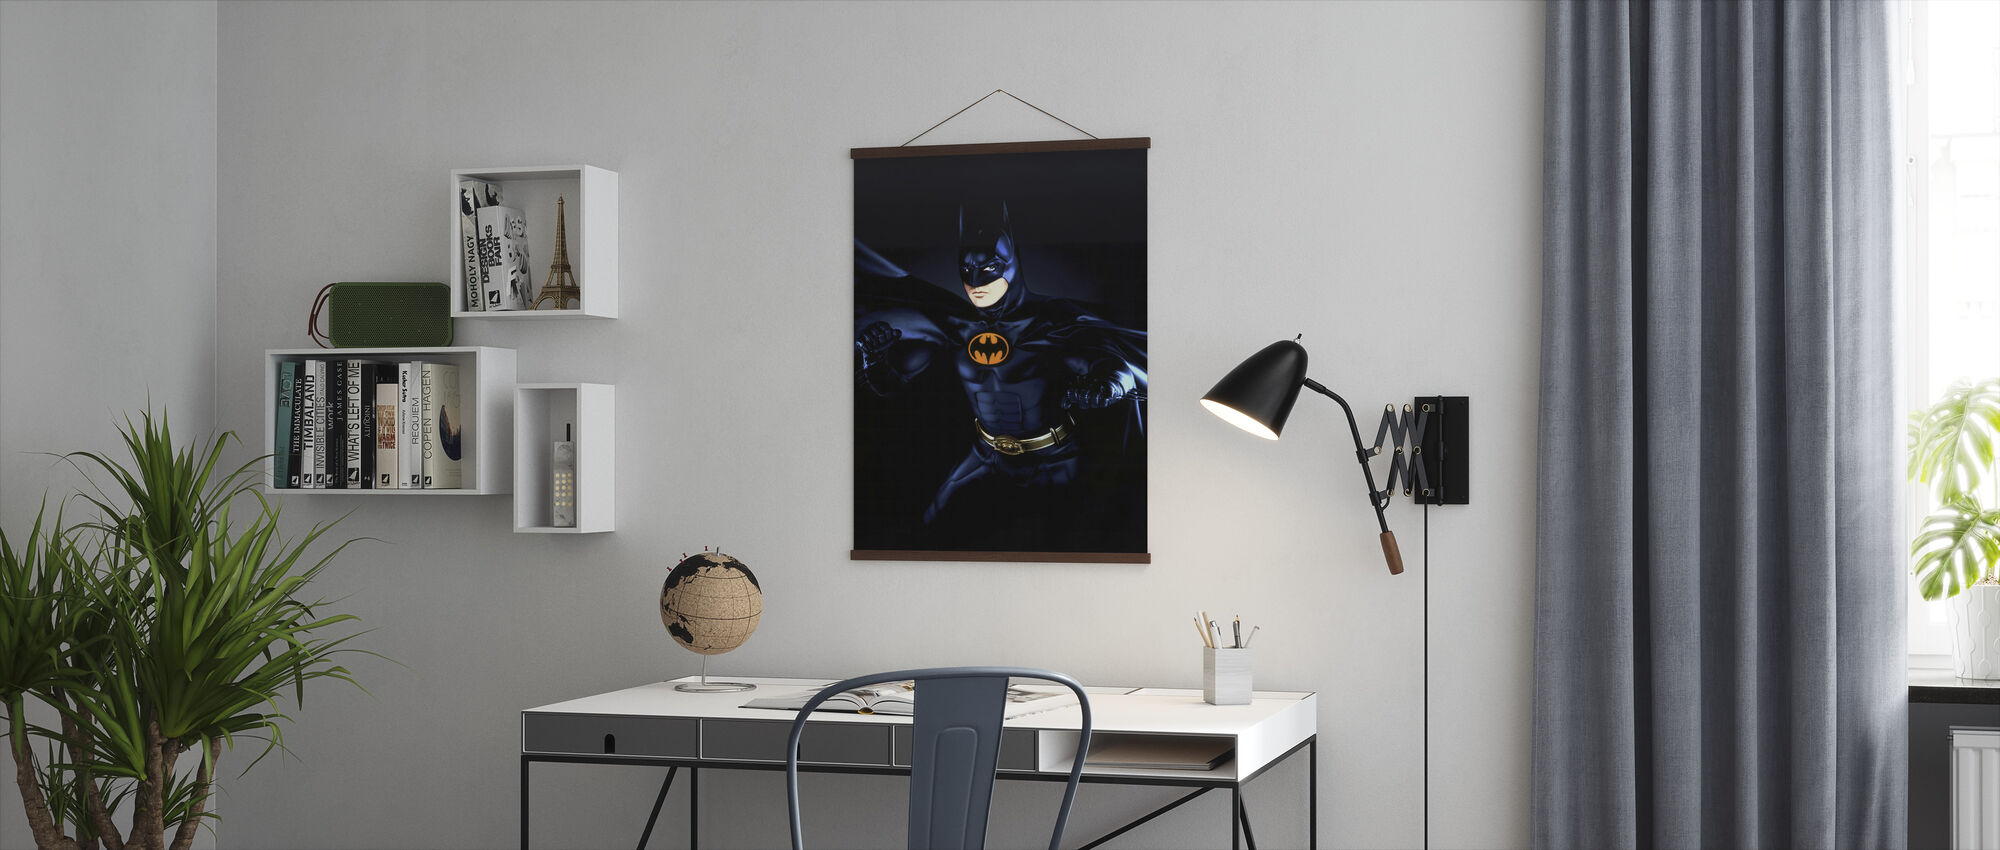 Michael Keaton in Batman Returns - Poster - Office